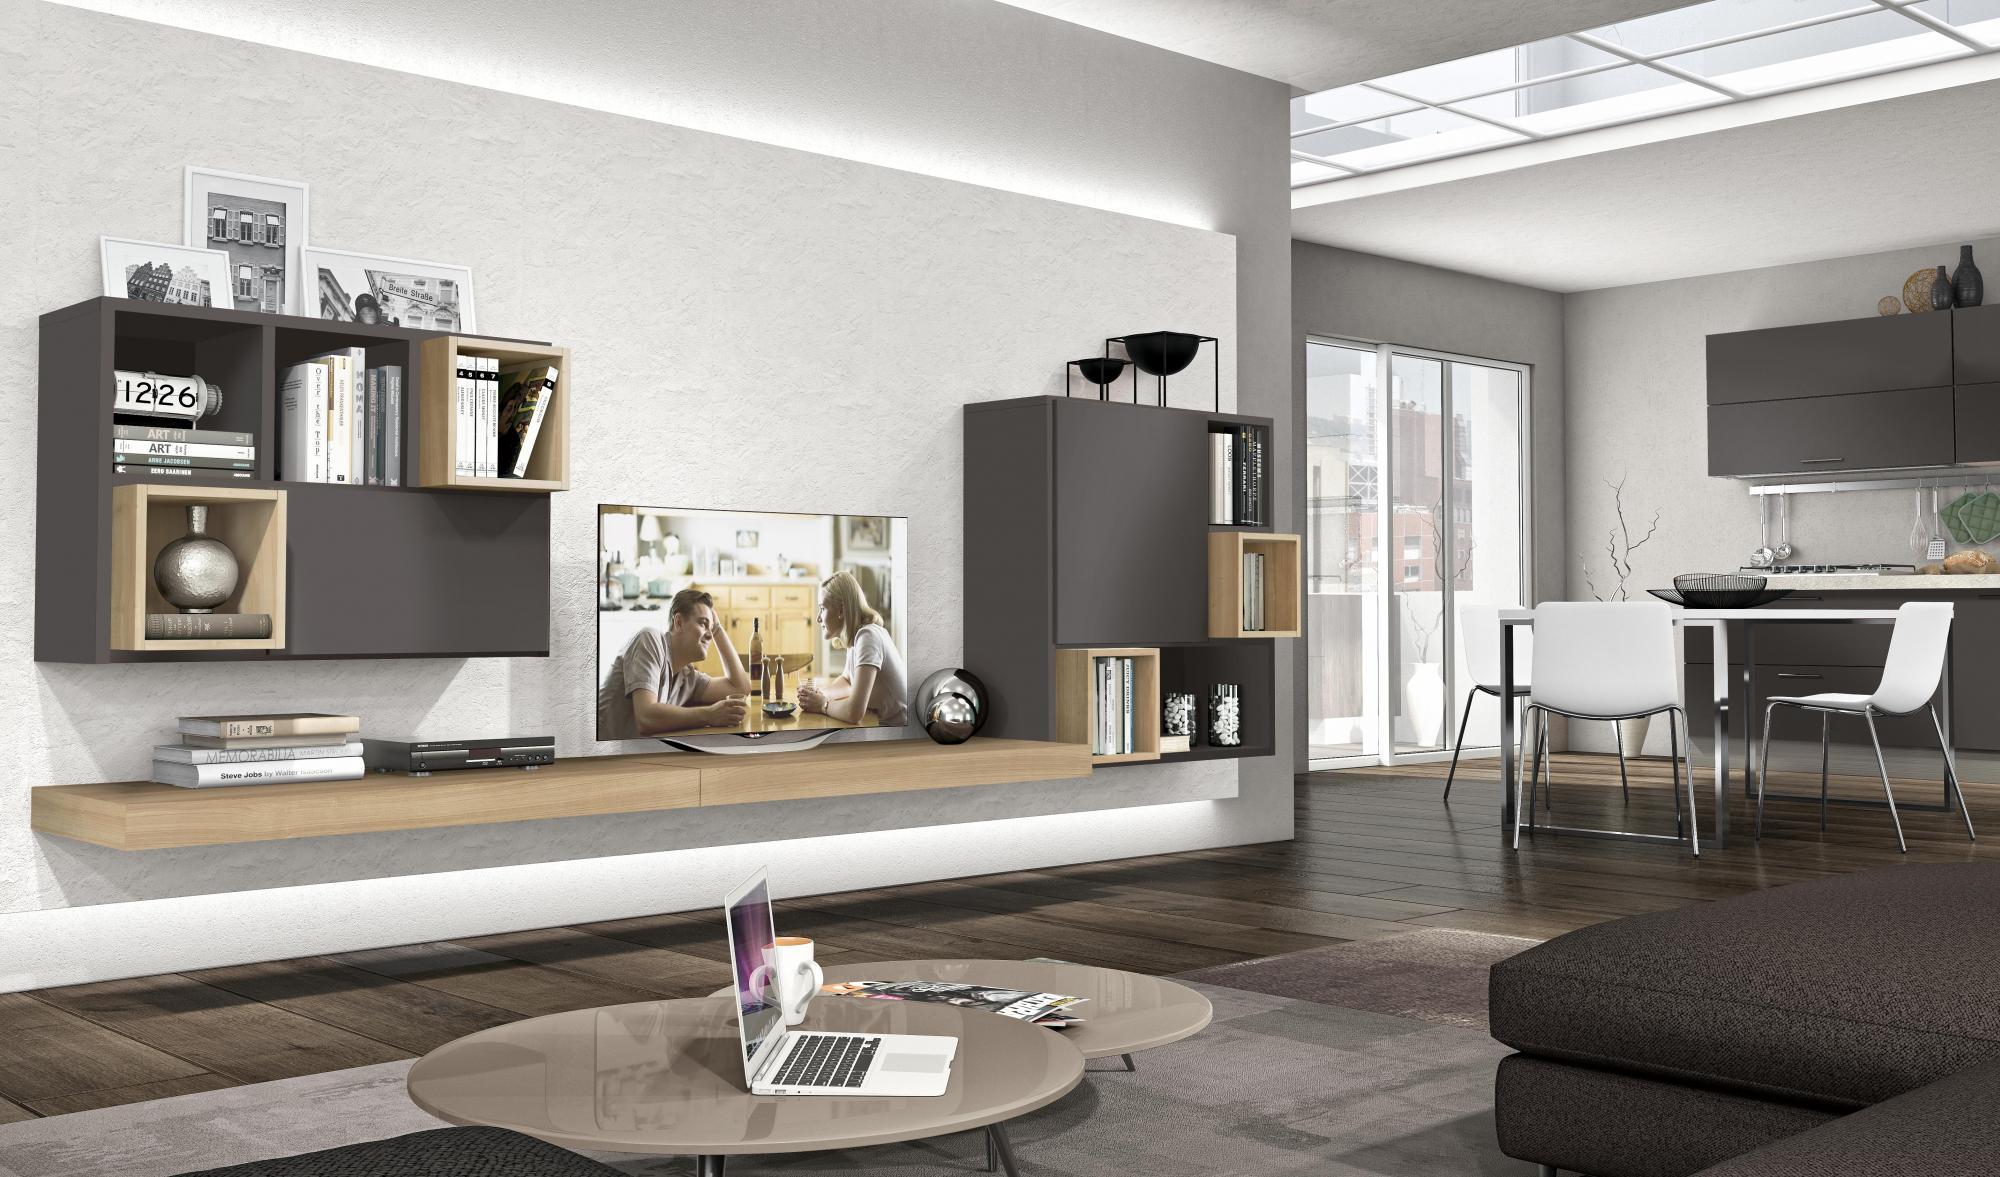 Home for Sale da pranzo moderne 12